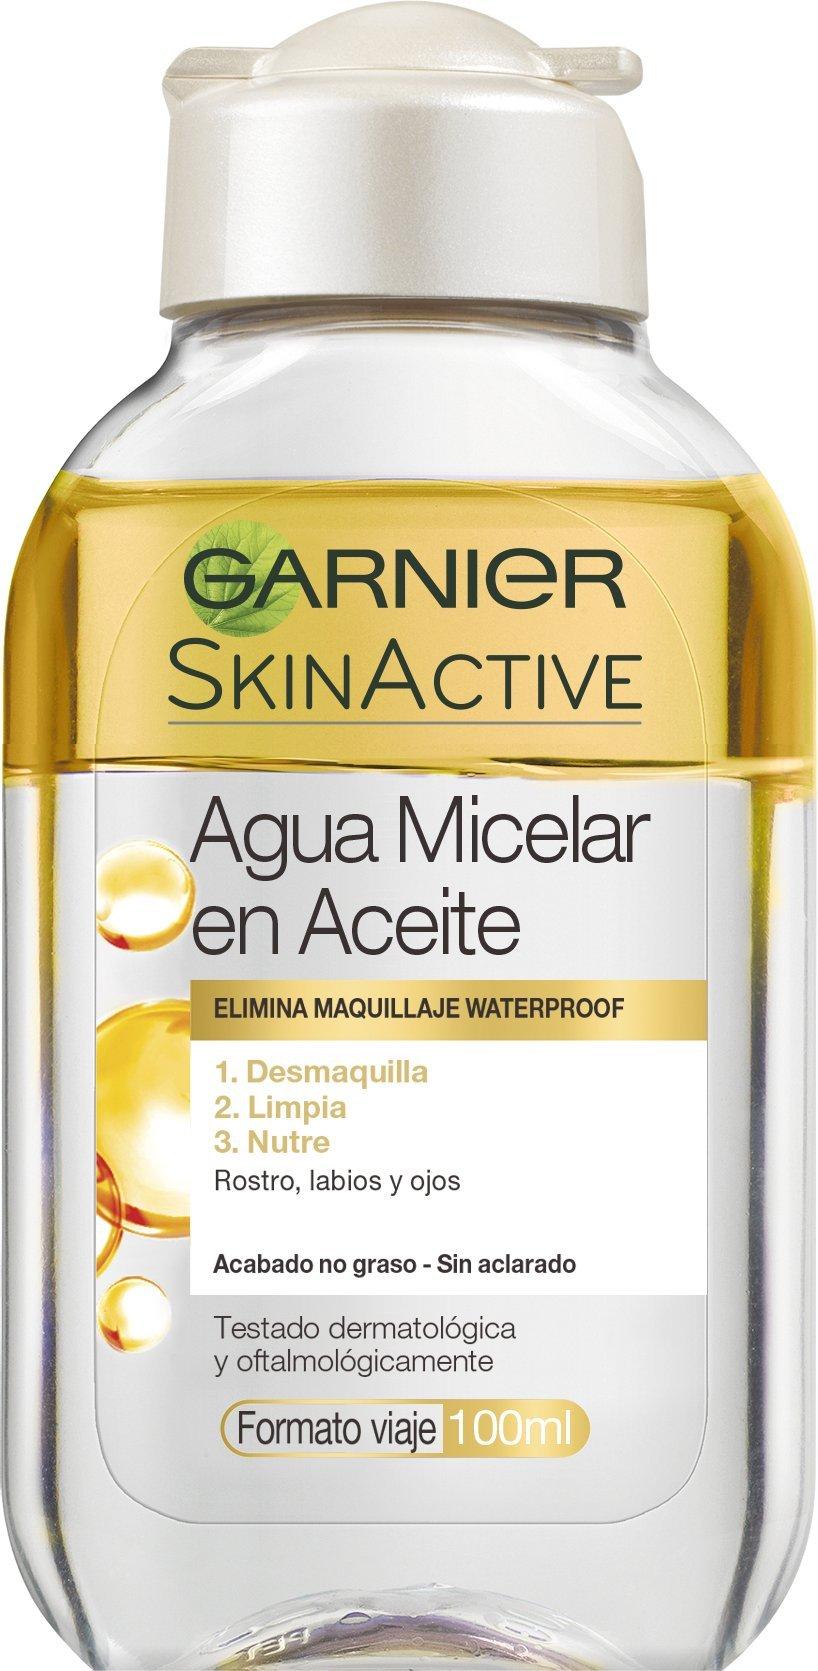 Garnier SkinActive Agua Micelar en Aceite – 100 ml